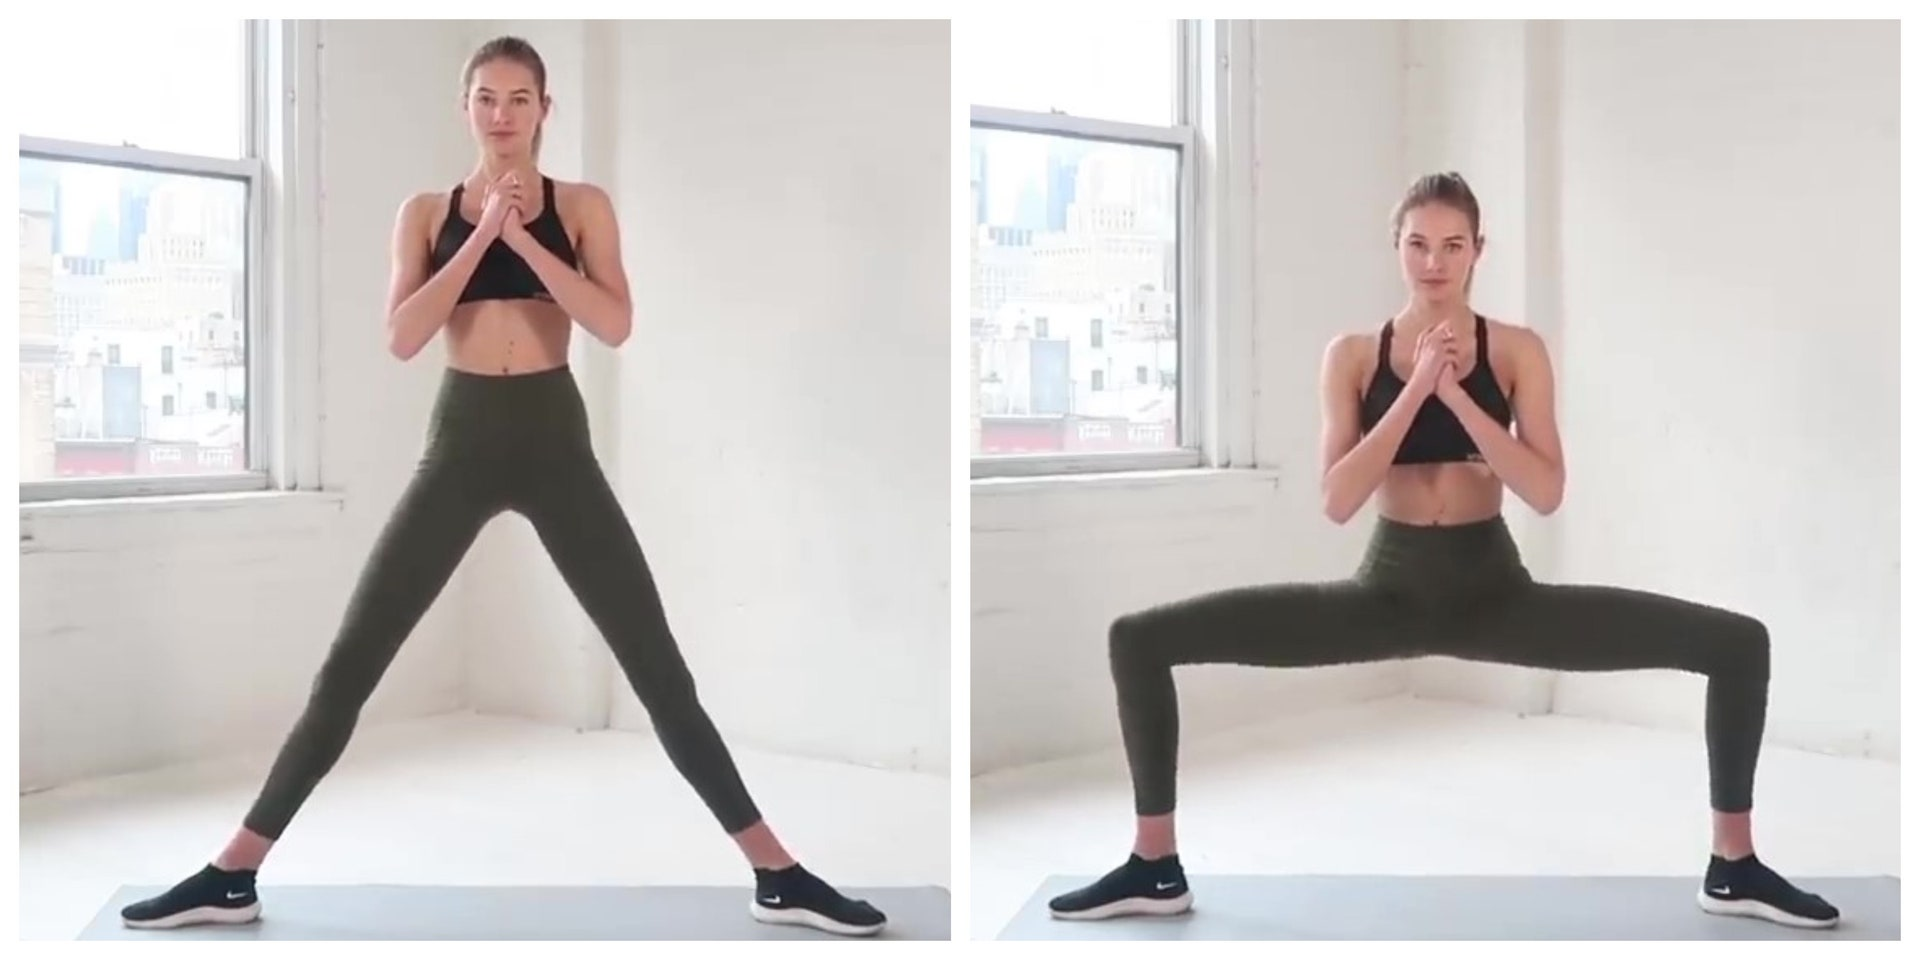 【VG享受運動】消除大腿內側贅肉5招跟著超模Sanne在家練出緊實美腿